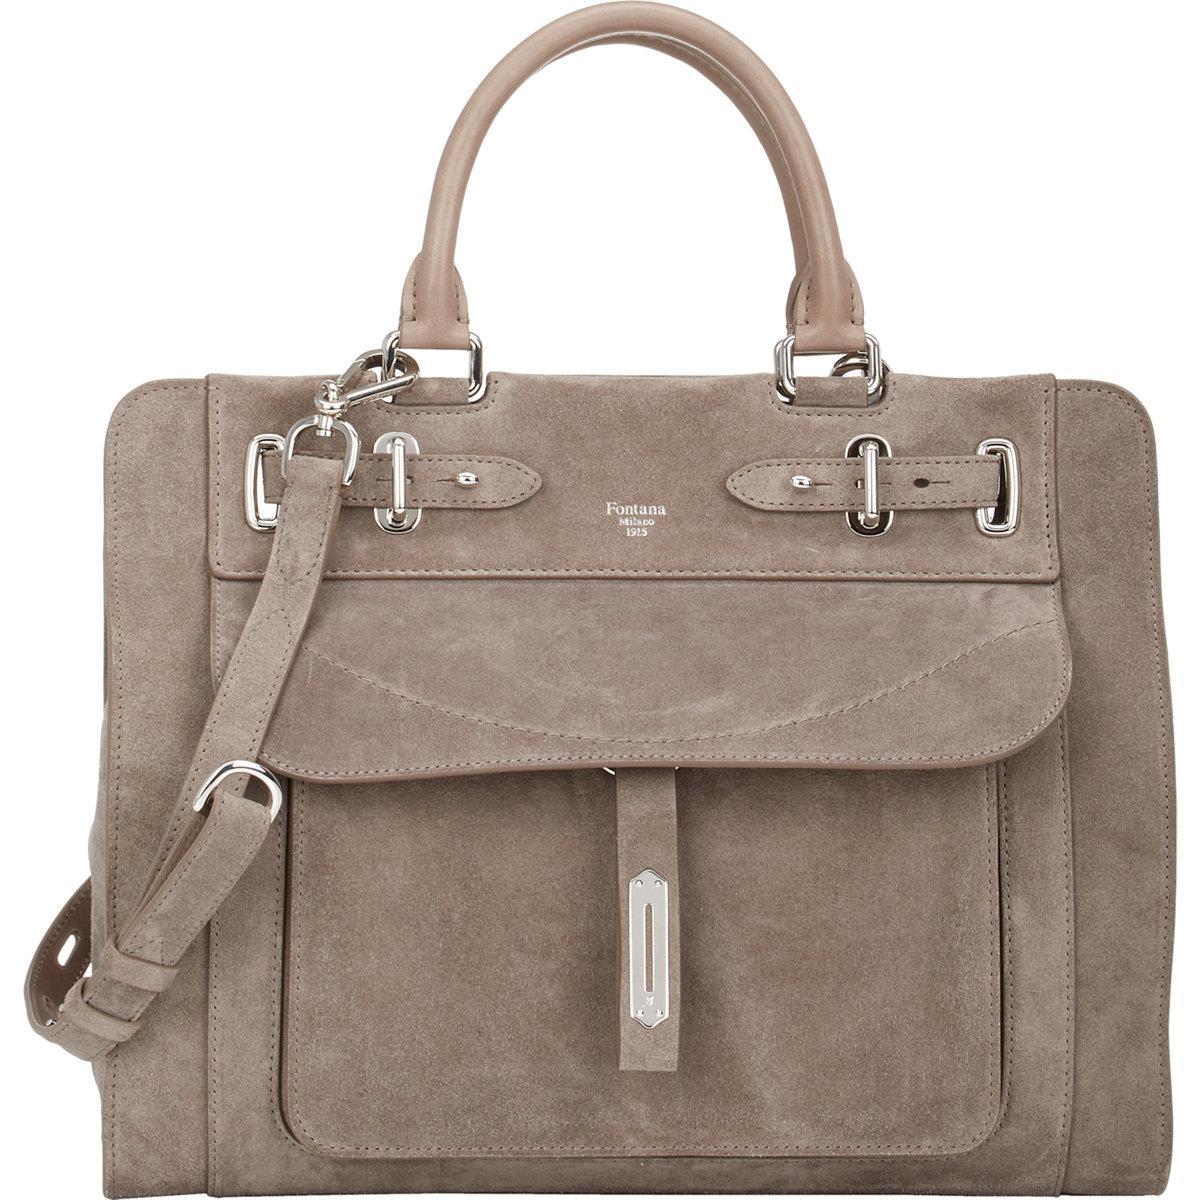 1915 Womens Small A Bag Satchel Fontana Milano Fake Cheap Online Cheap Sale Countdown Package Cheap Sale Fashion Style For Nice Cheap Best Wholesale 0pki3r9h